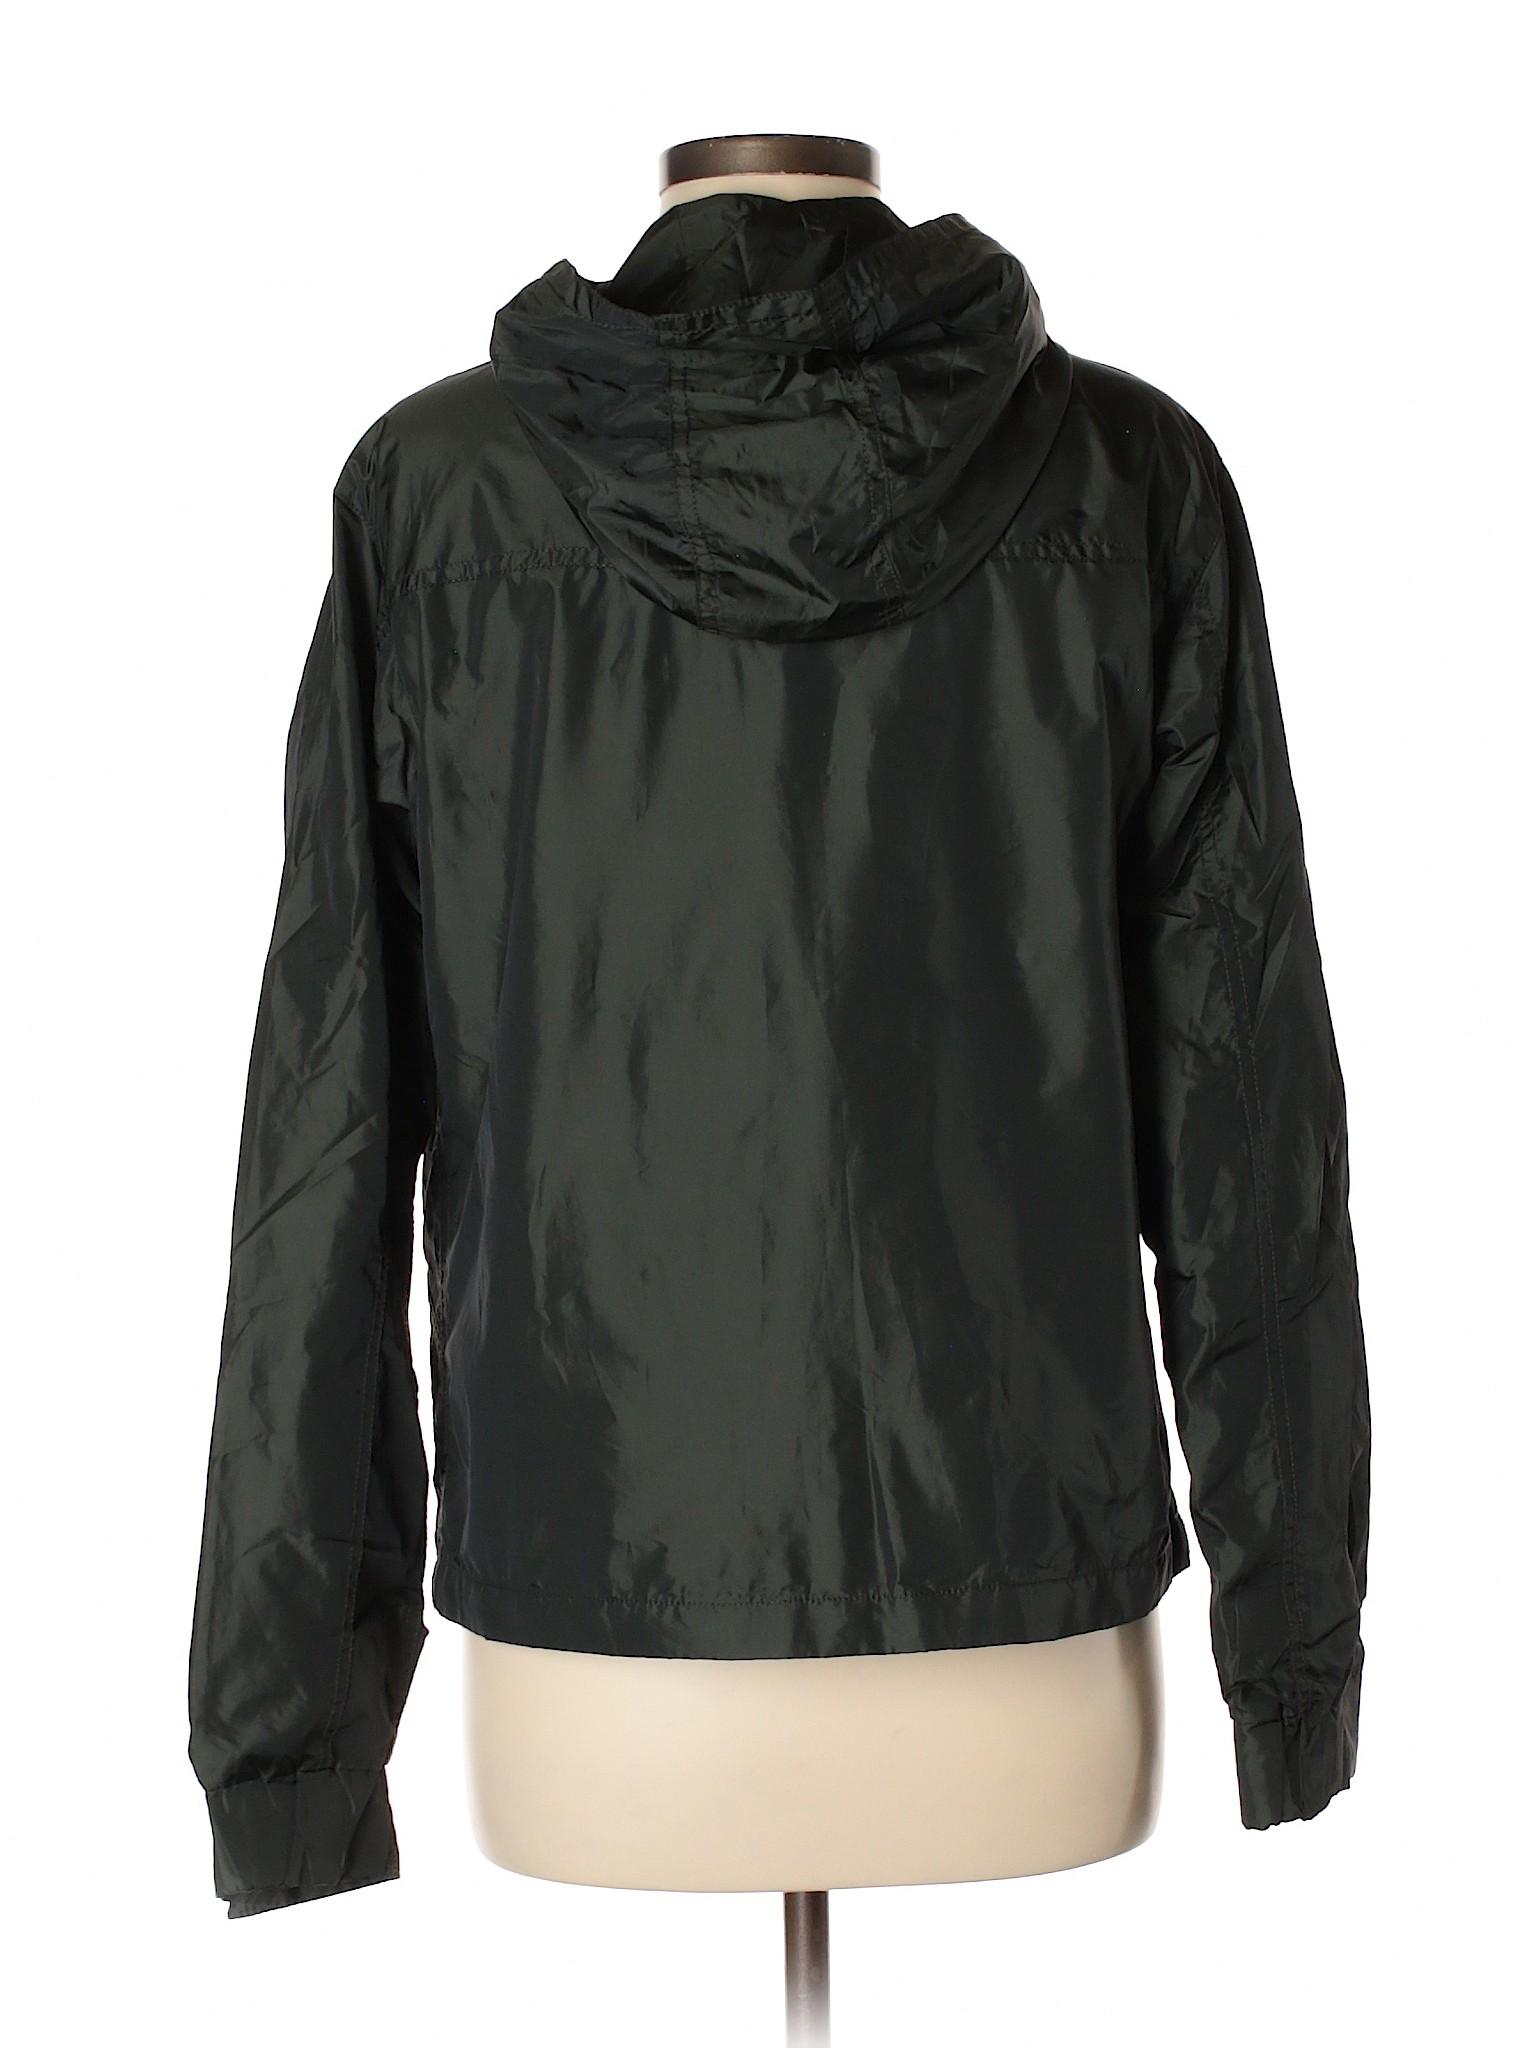 Polo Jacket Boutique Ralph Lauren Jeans by RLHfue0o8C winter S1q51wR